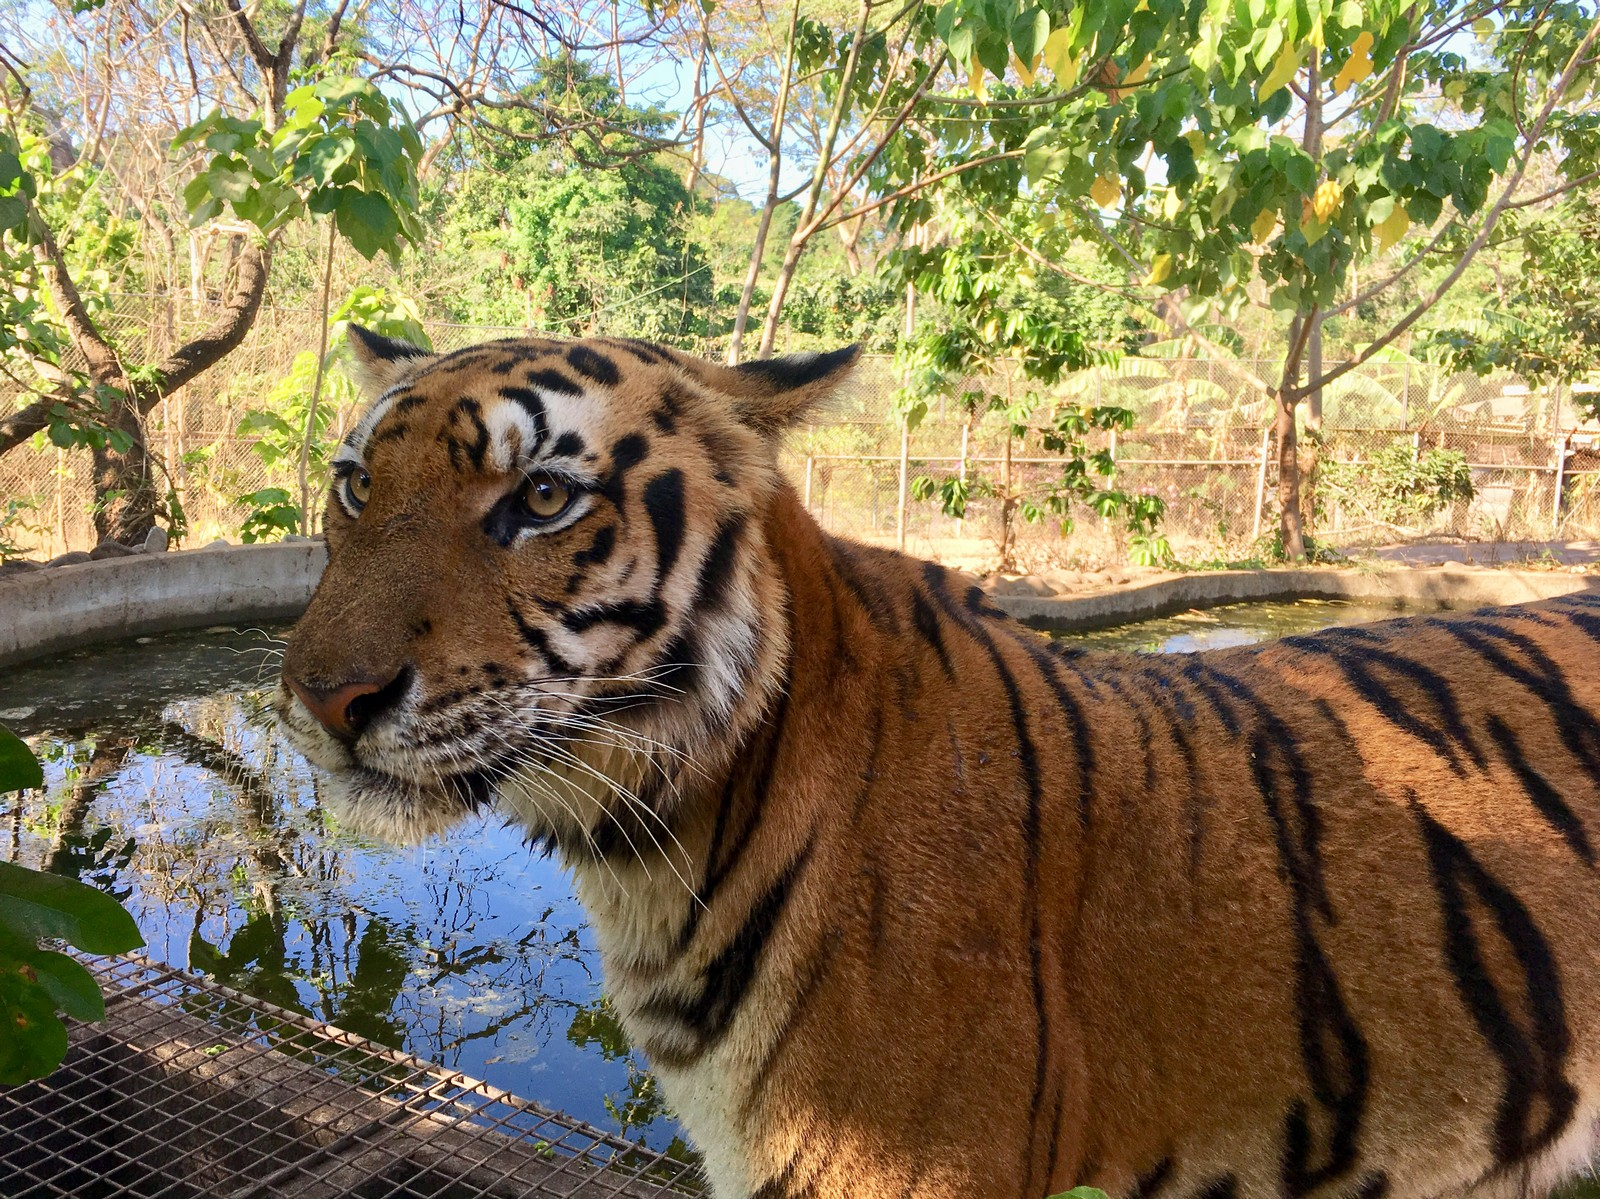 Zoobic Safari & Bat Kingdom Day Tour with Buffet Lunch